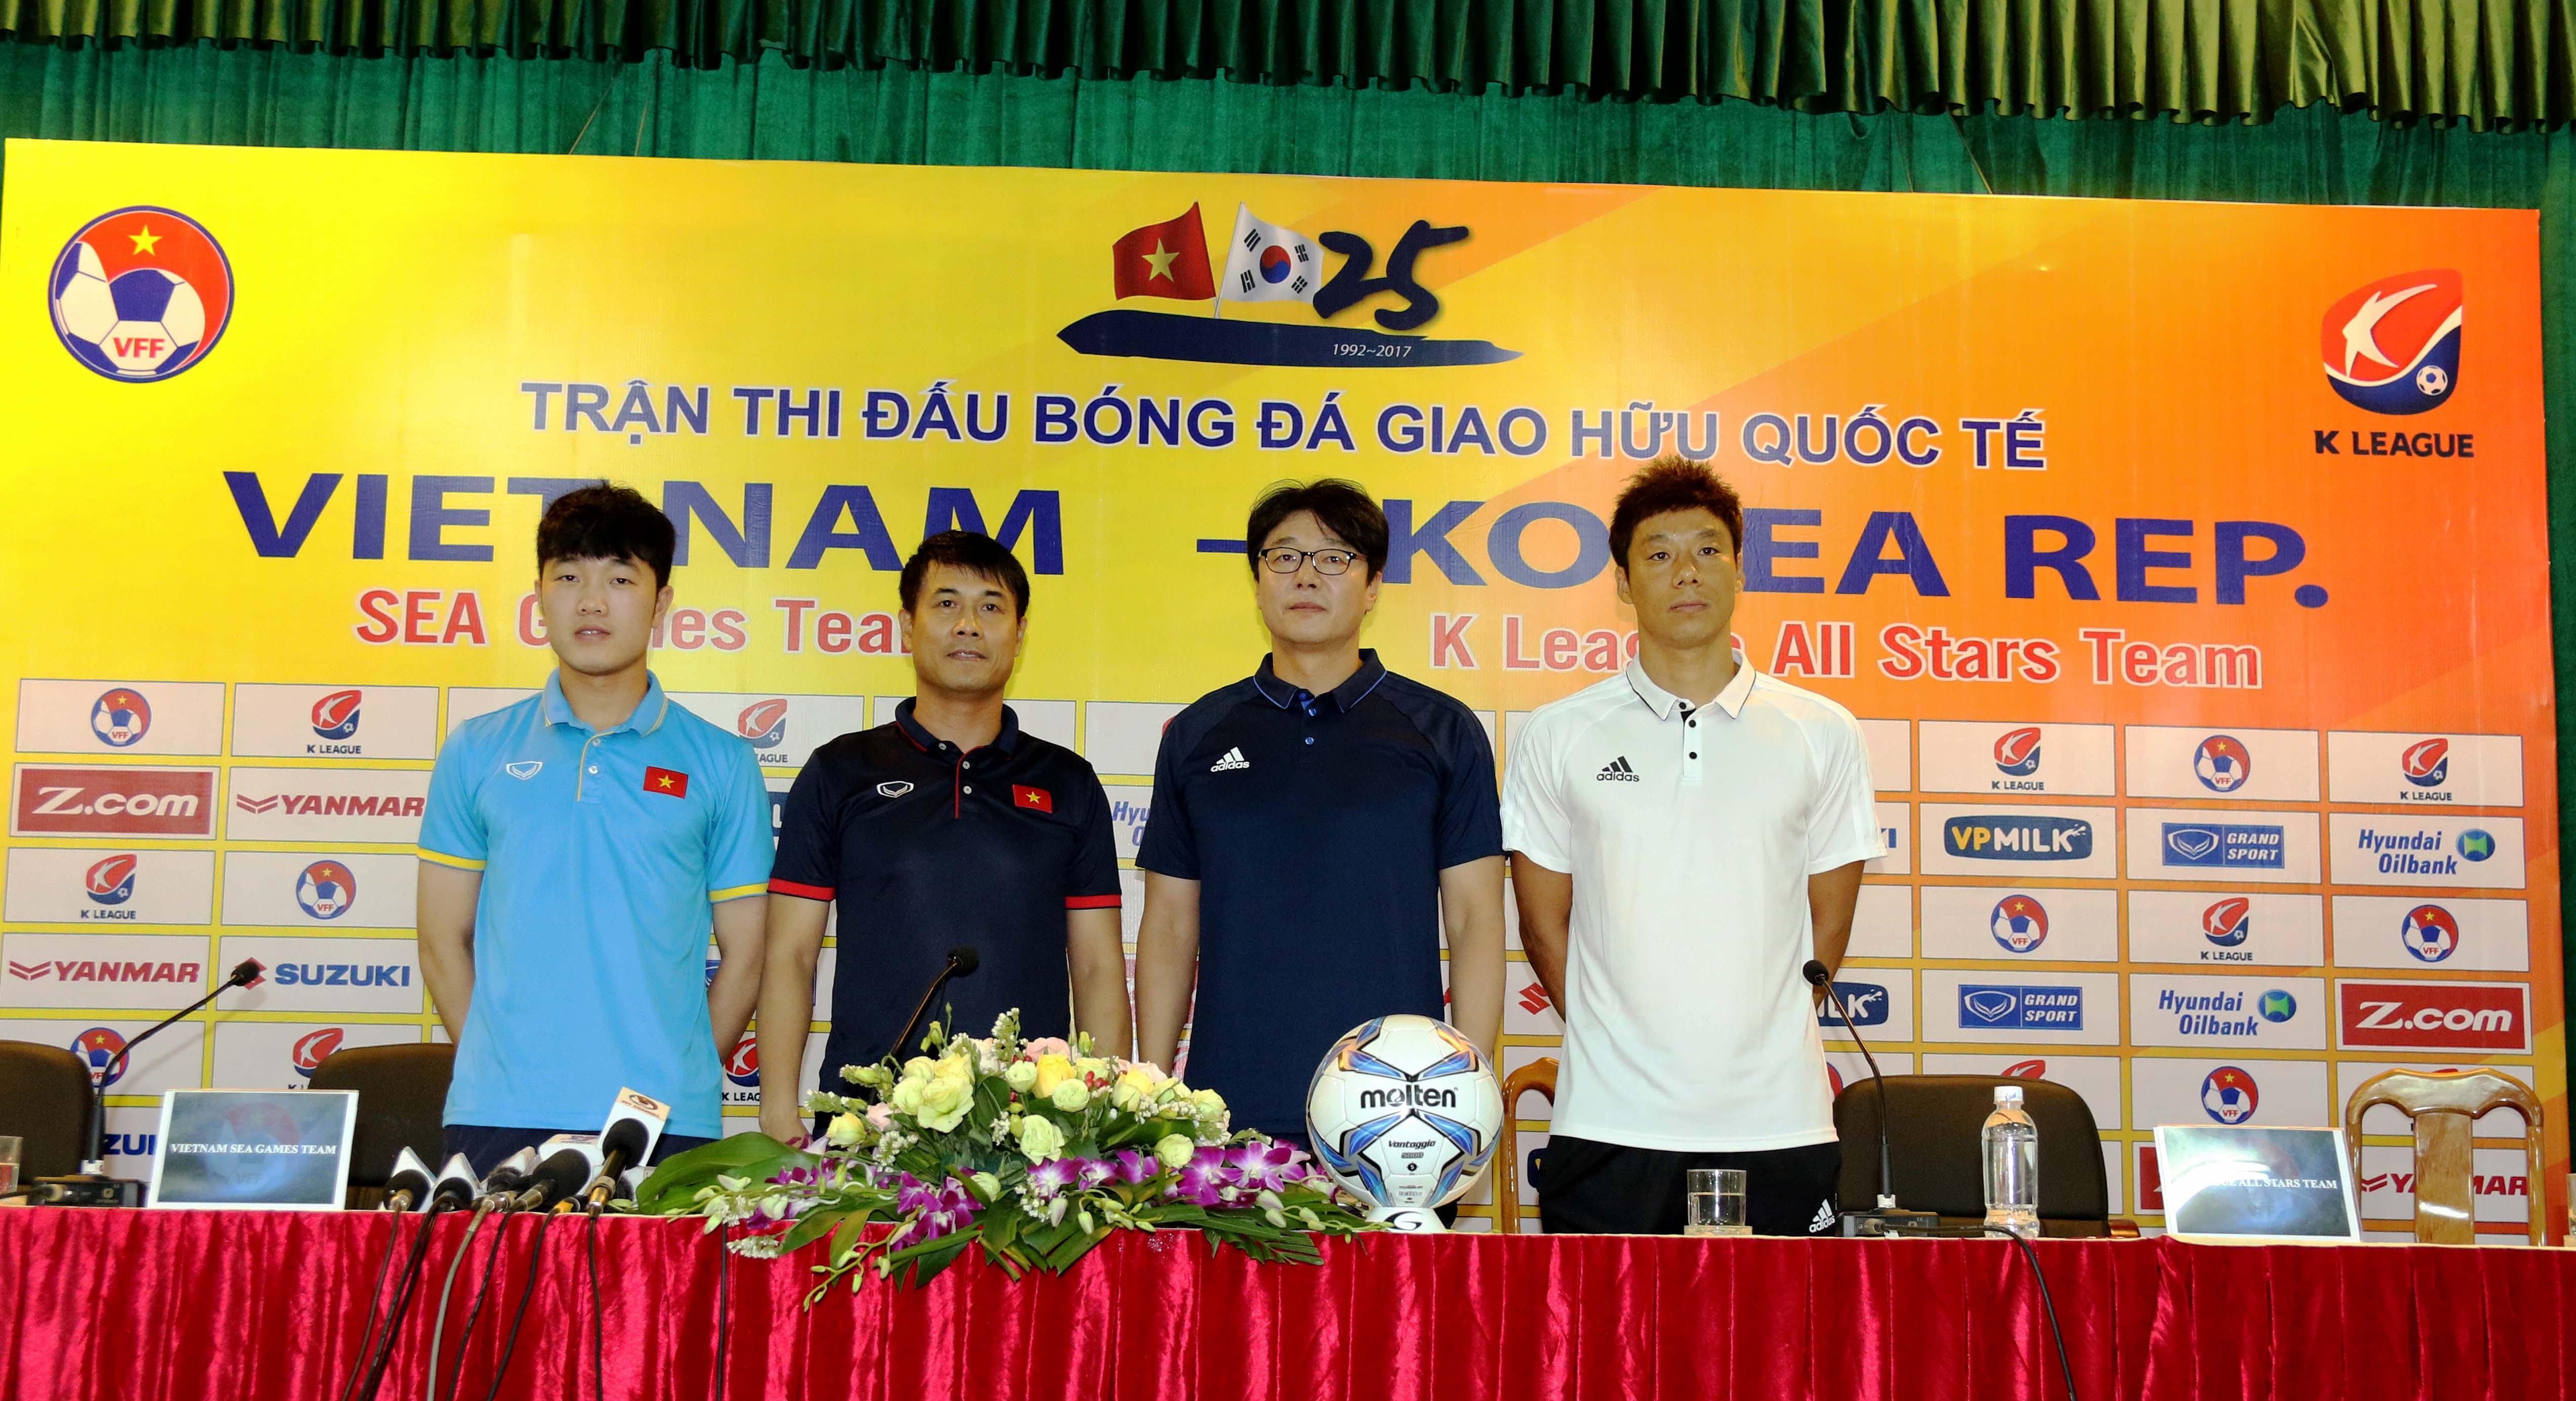 Họp báo U22 Việt Nam K League All Stars